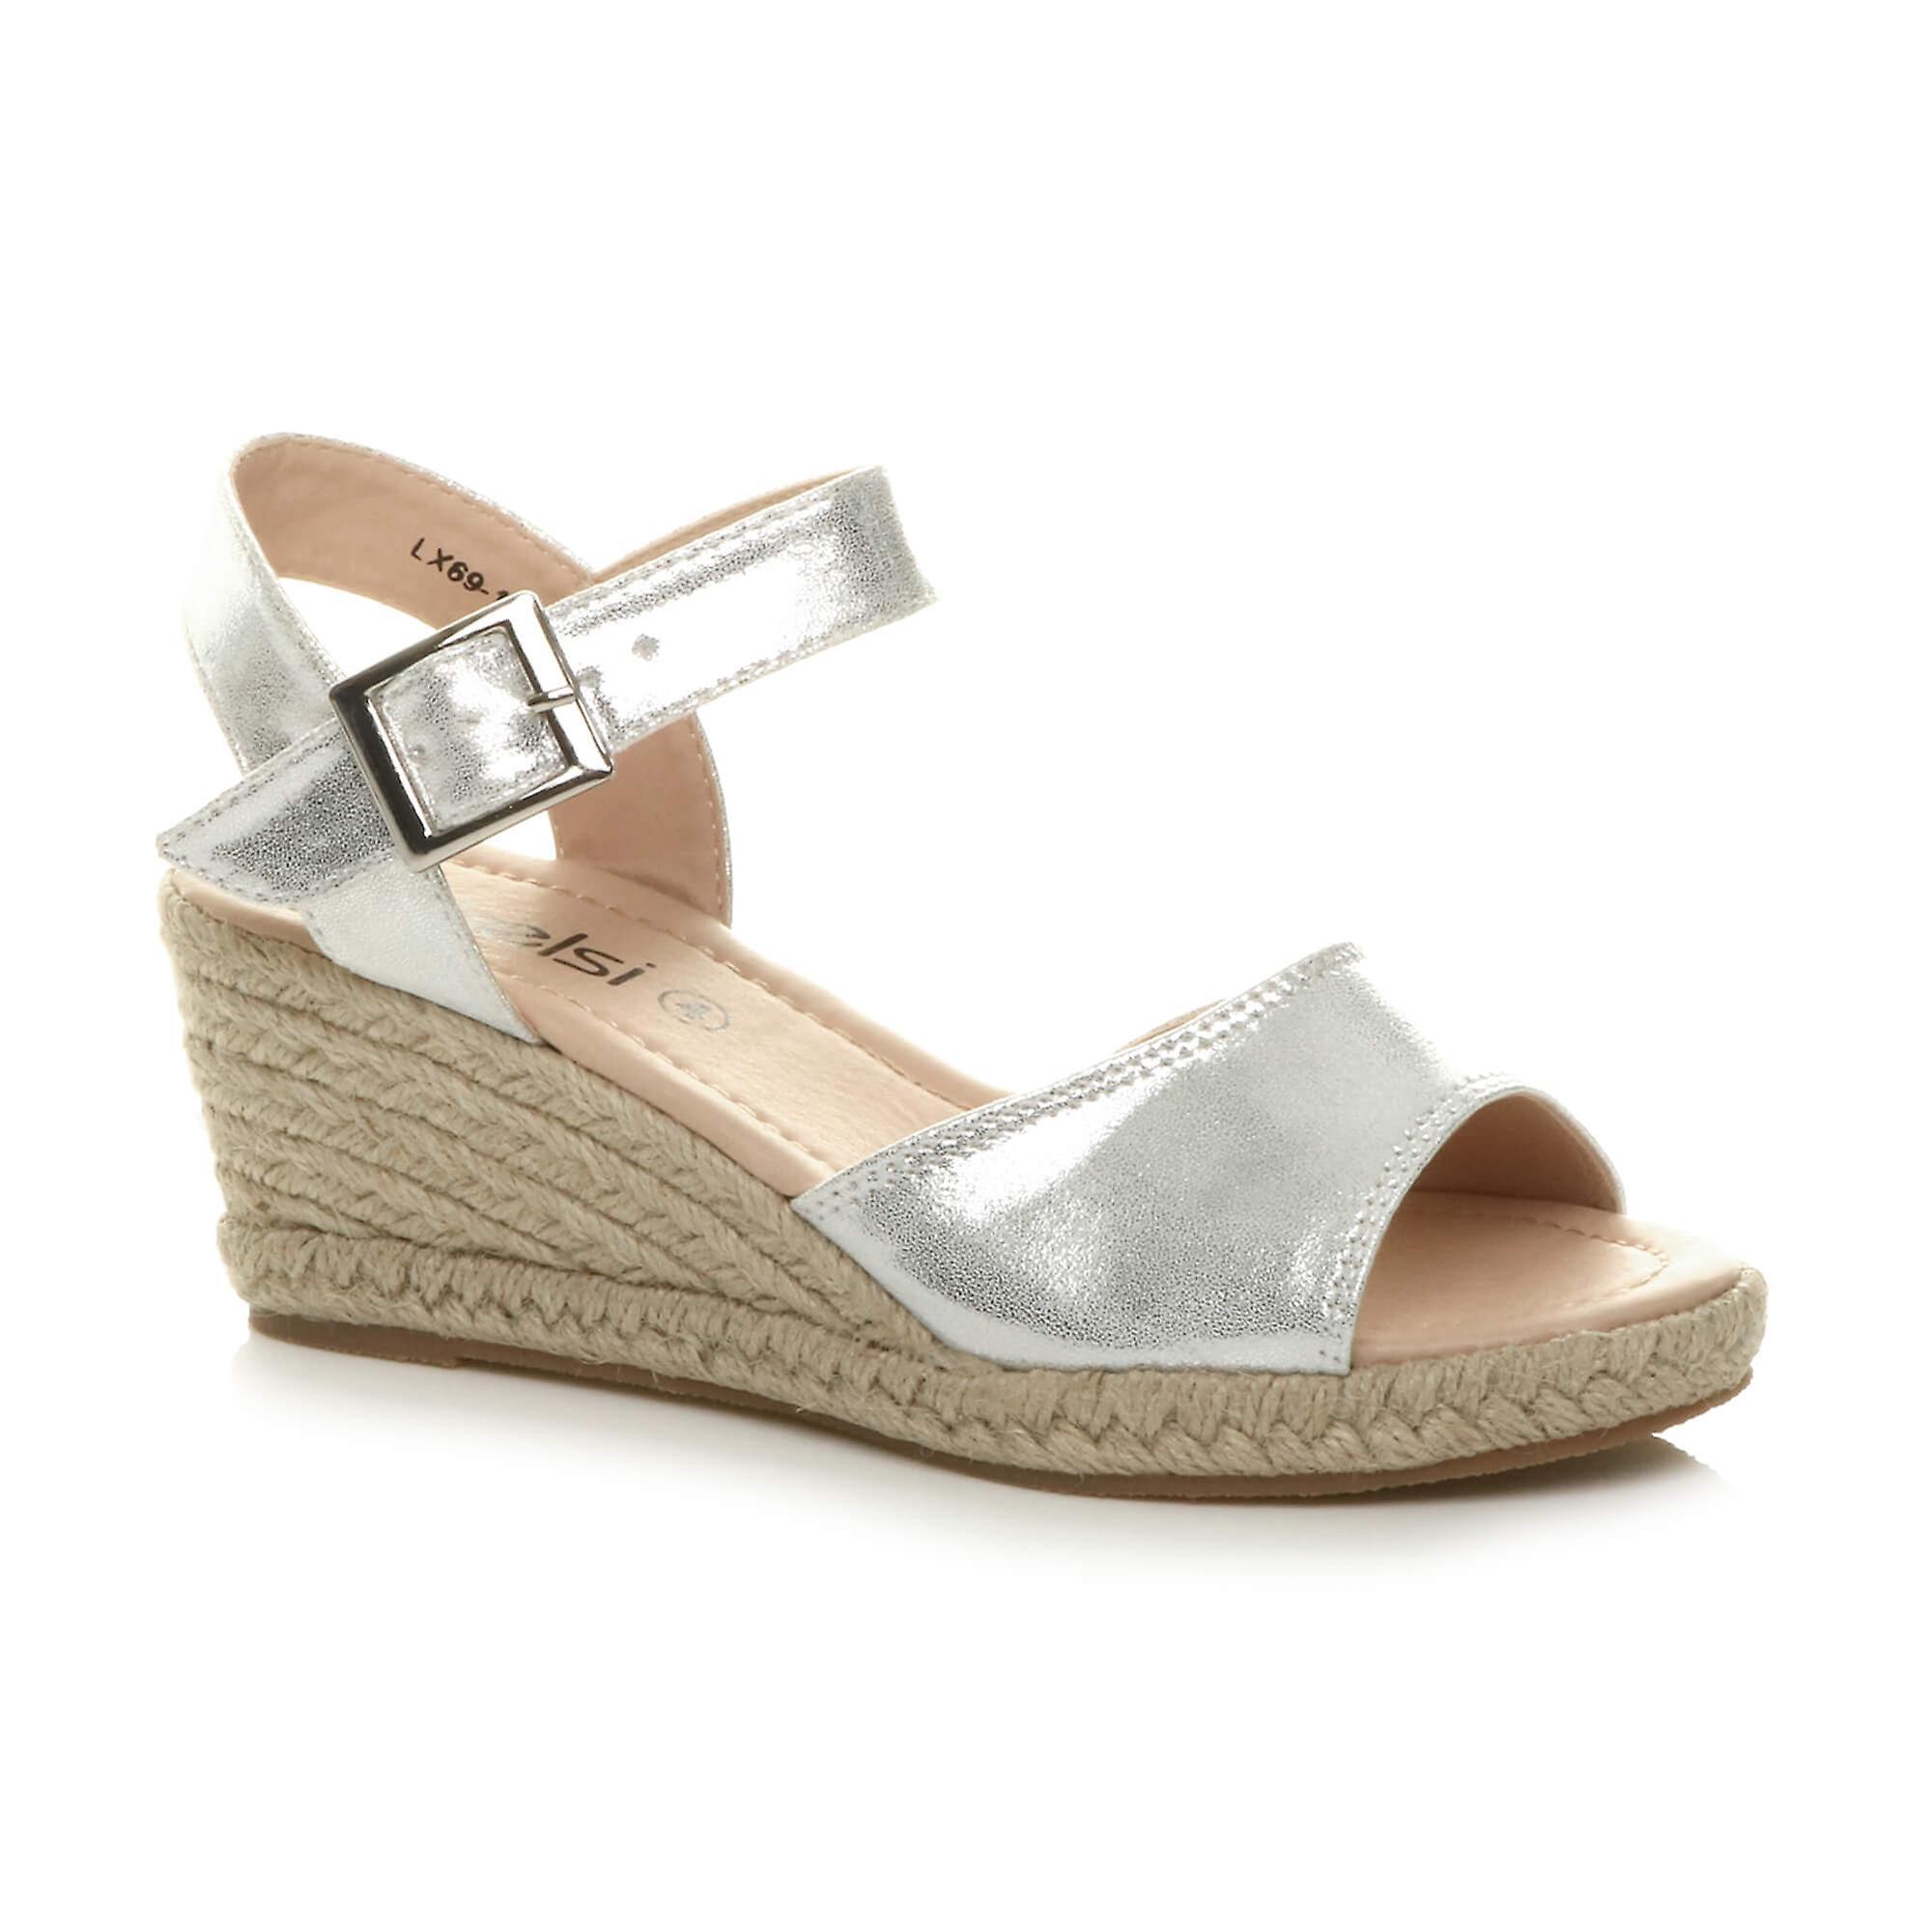 Ajvani Womens mid heel summer buckle espadrille platform wedge sandals HWaPj